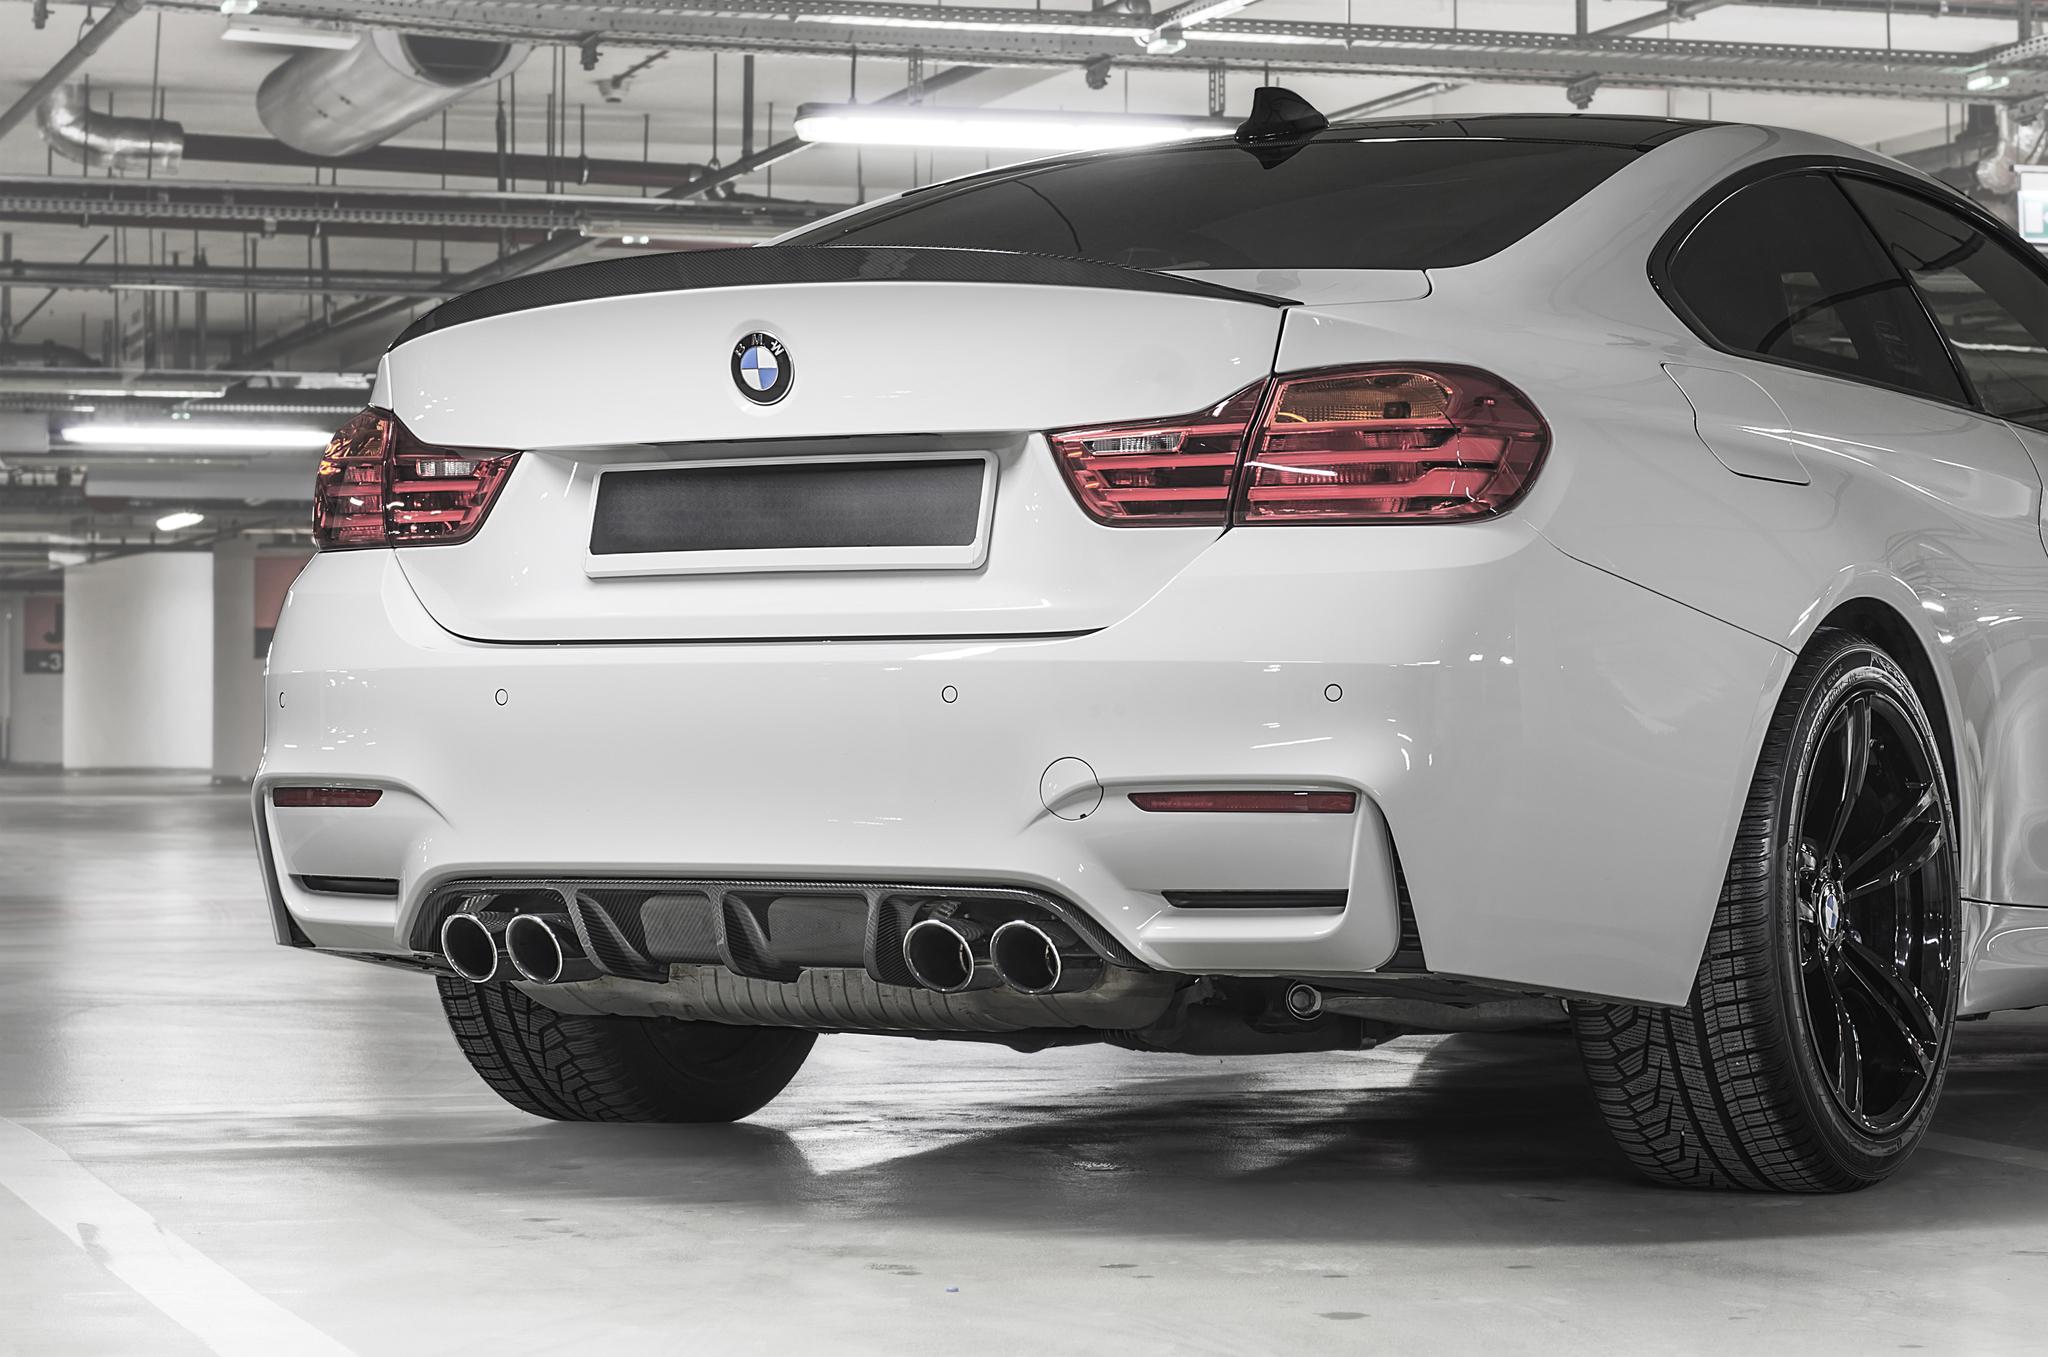 Sterckenn Carbon Fiber diffuser for BMW M4 F82 latest model